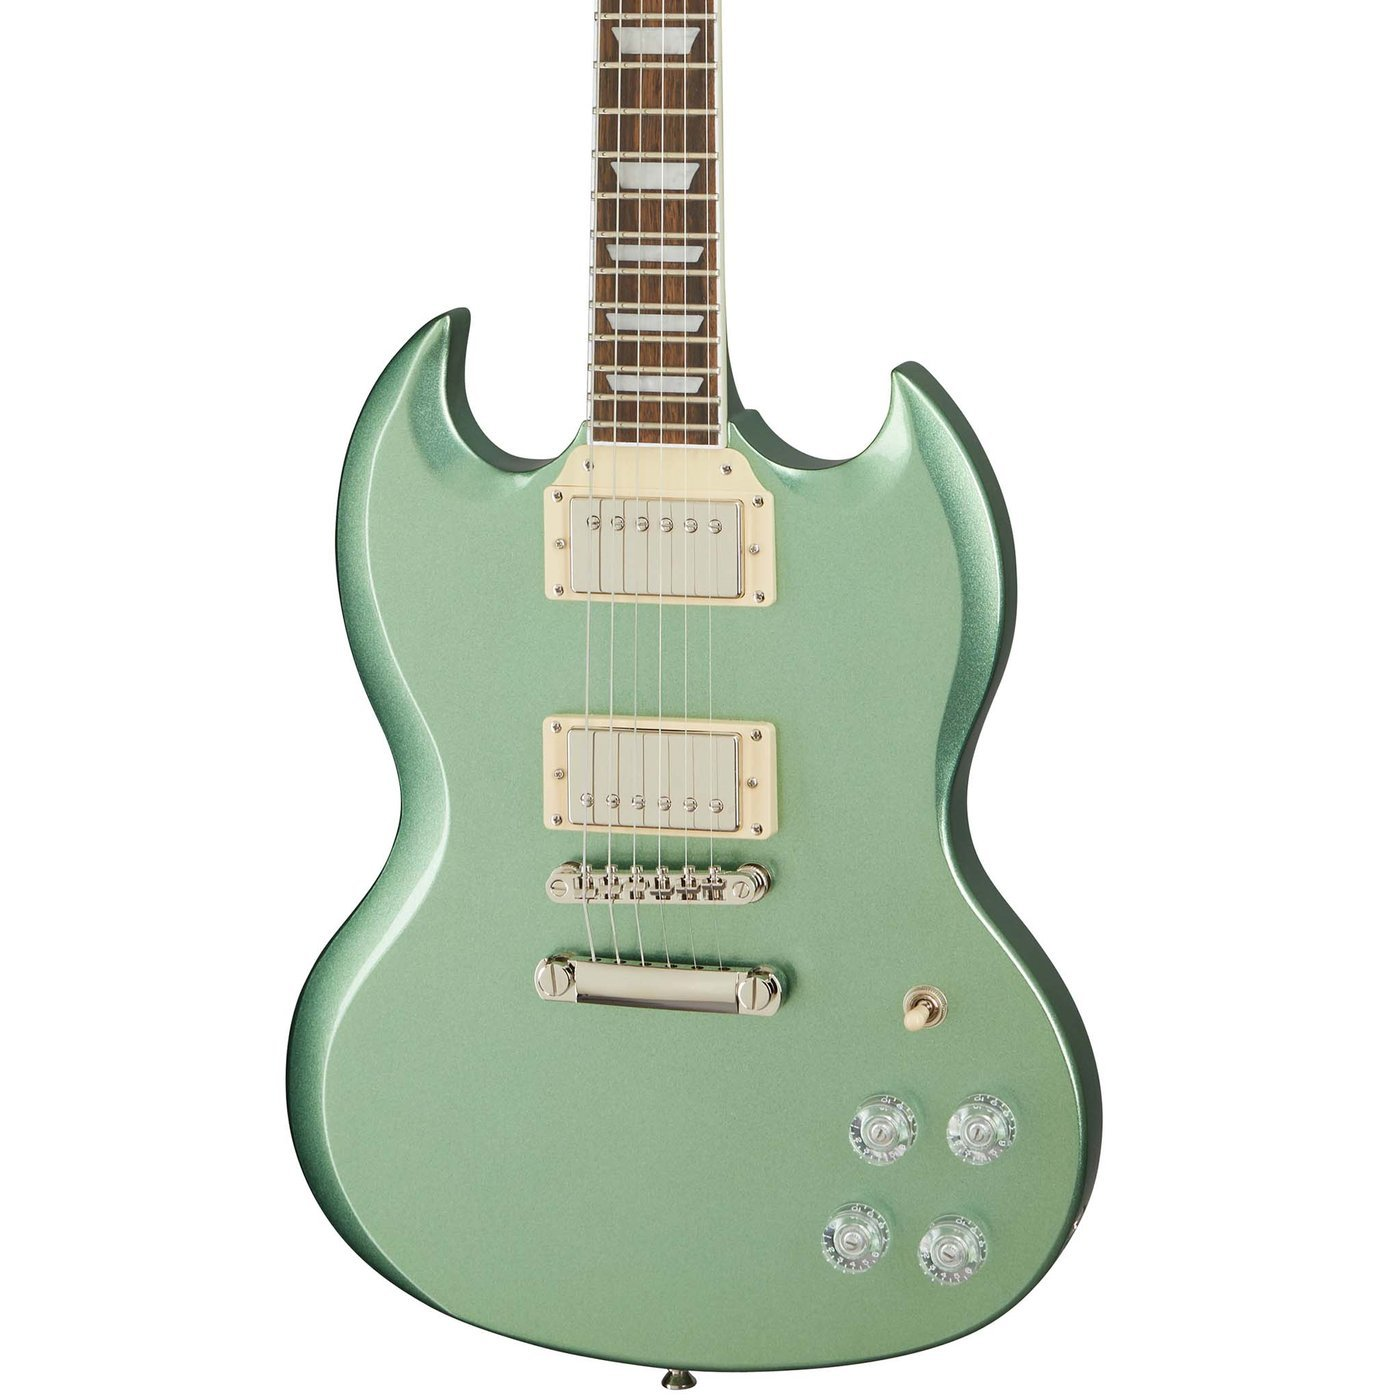 Epiphone SG Muse Wanderlust Green Metallic Electric Guitar